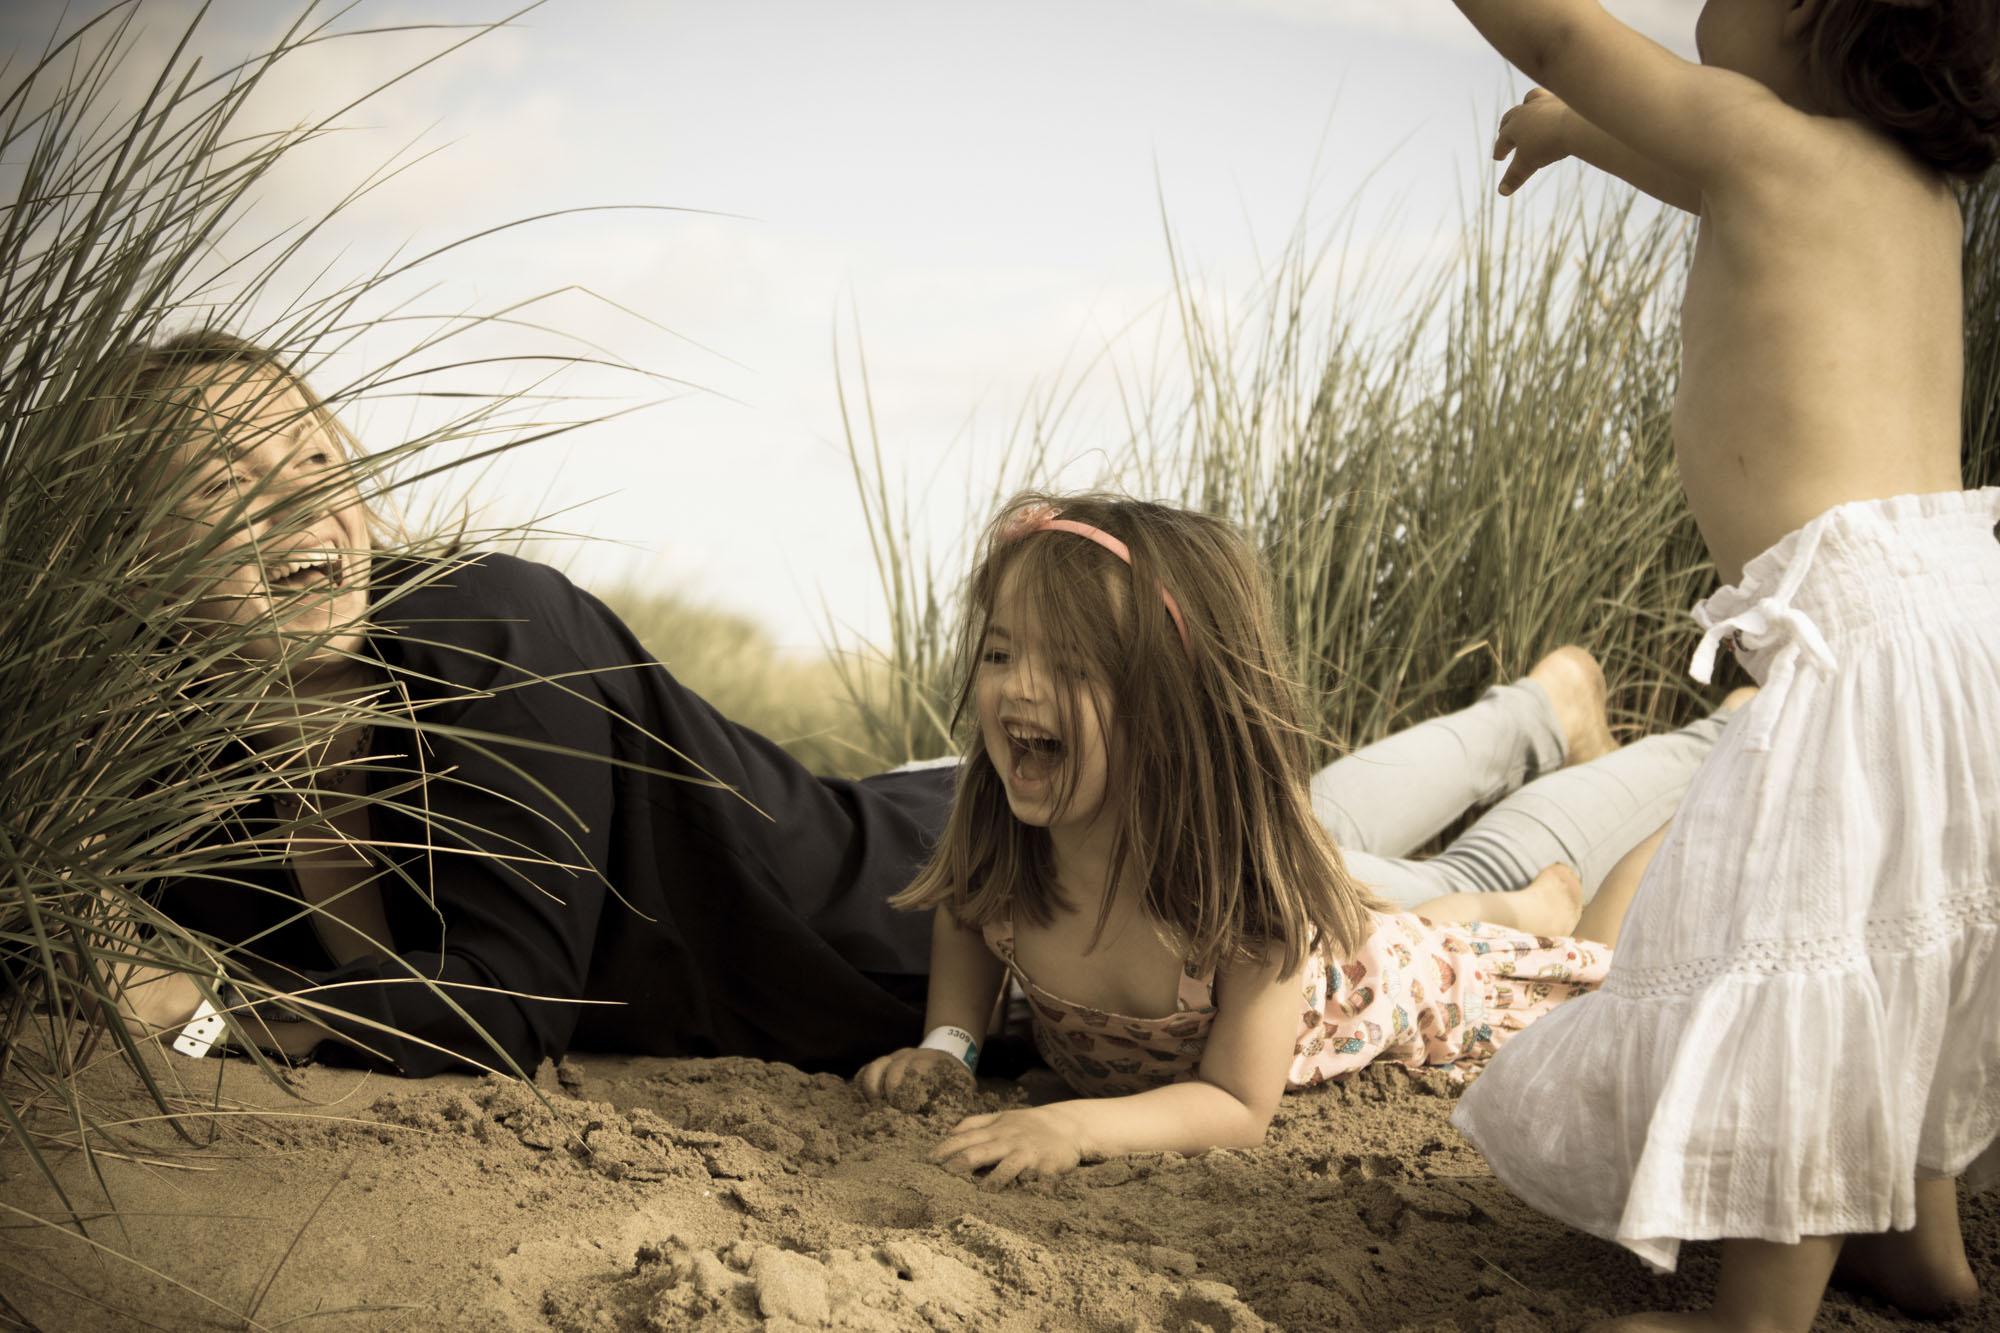 family-life-family-photographer-oxford-london-jonathan-self-photography-27.jpg